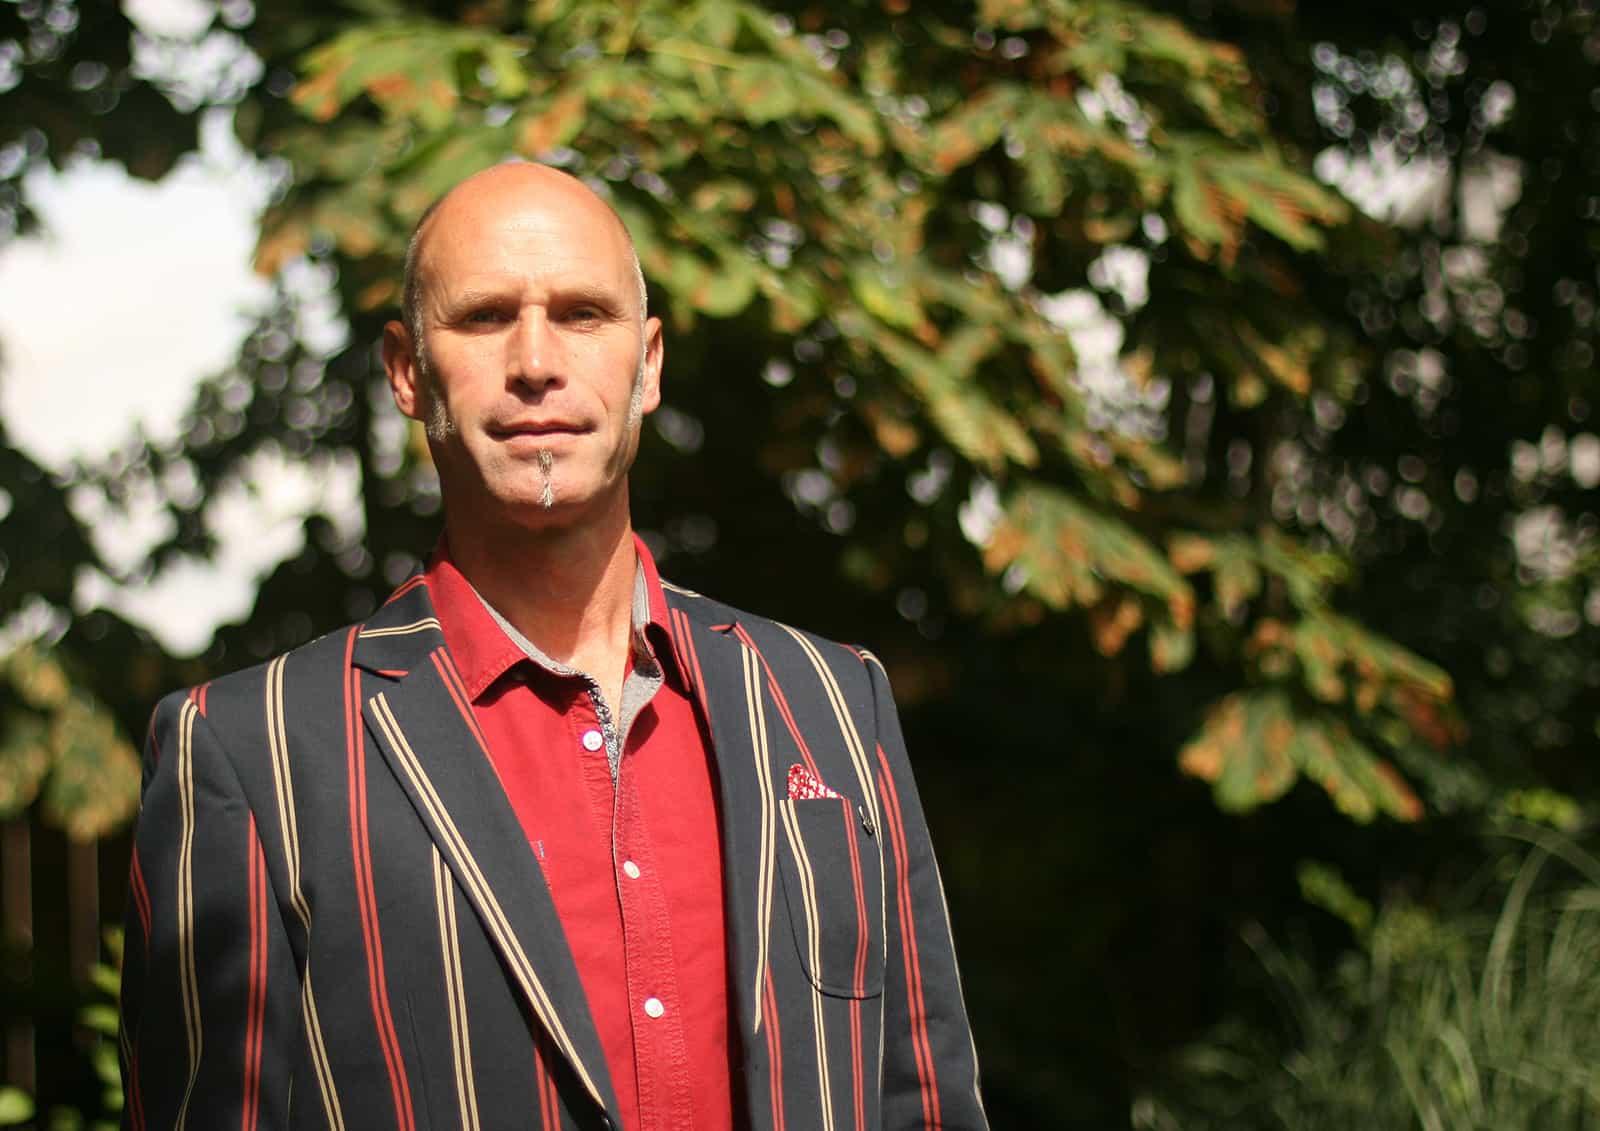 Steve Fane-de-Salis